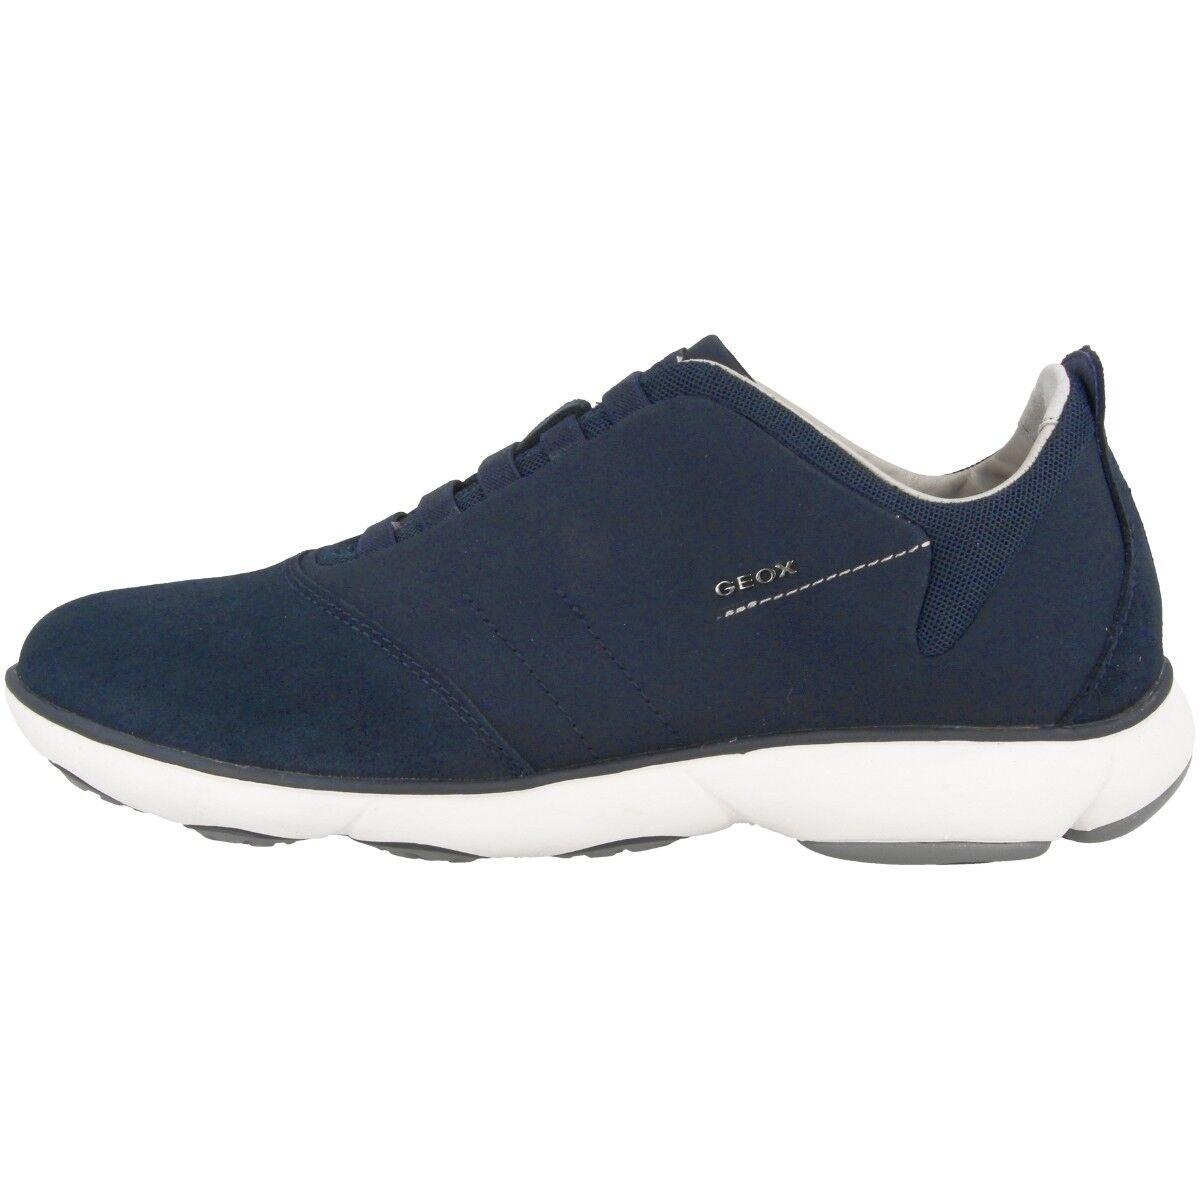 Geox Uomo U Nebula B Scarpe Uomo Geox Sneaker Casual Basse Blu Marino U52D7B0ZB22C4002 67b2e6